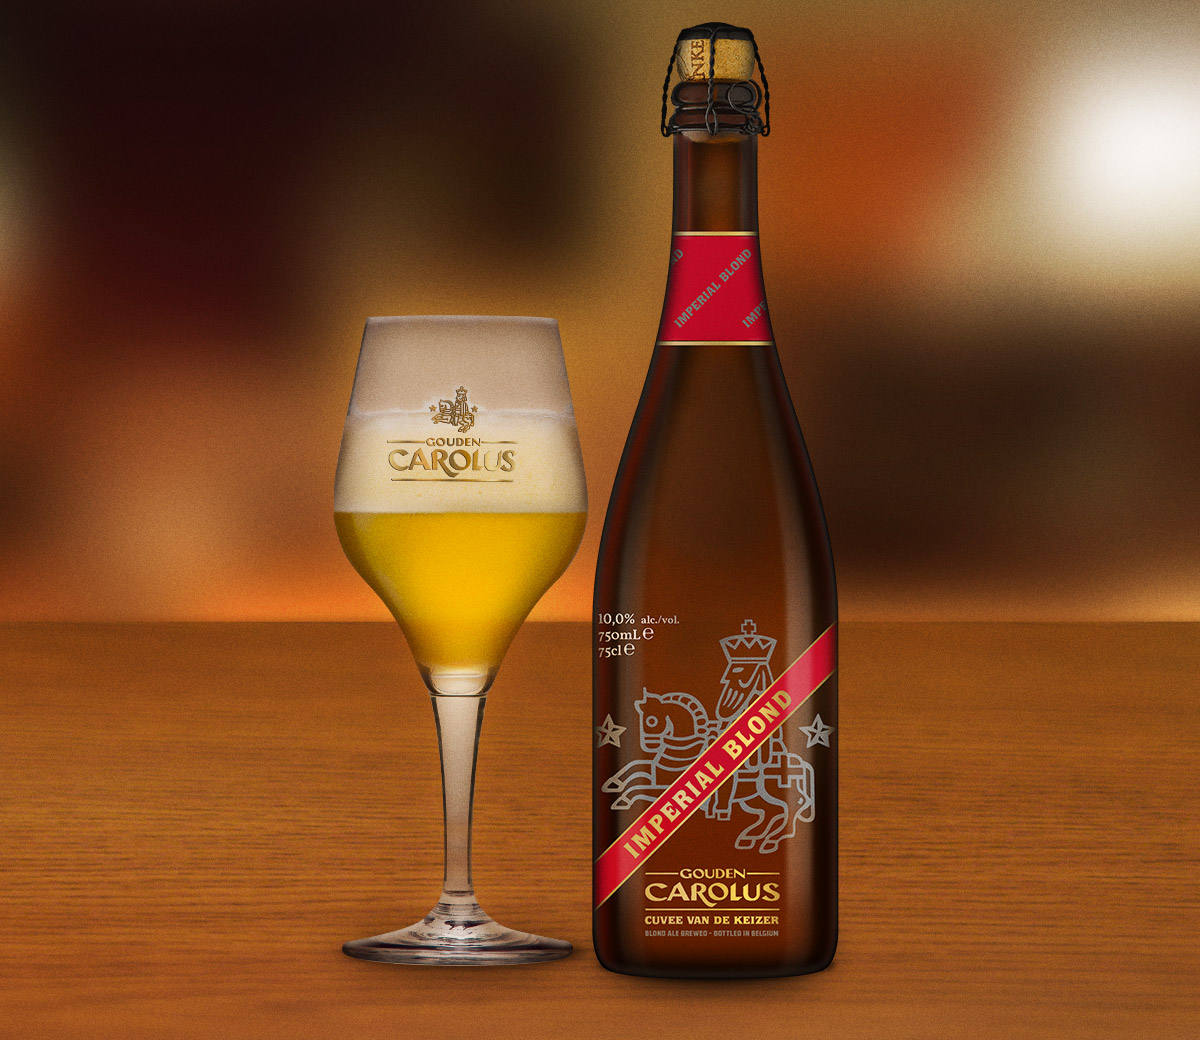 Gouden Carolus Cuvée van de Keizer Imperial Blond met glas